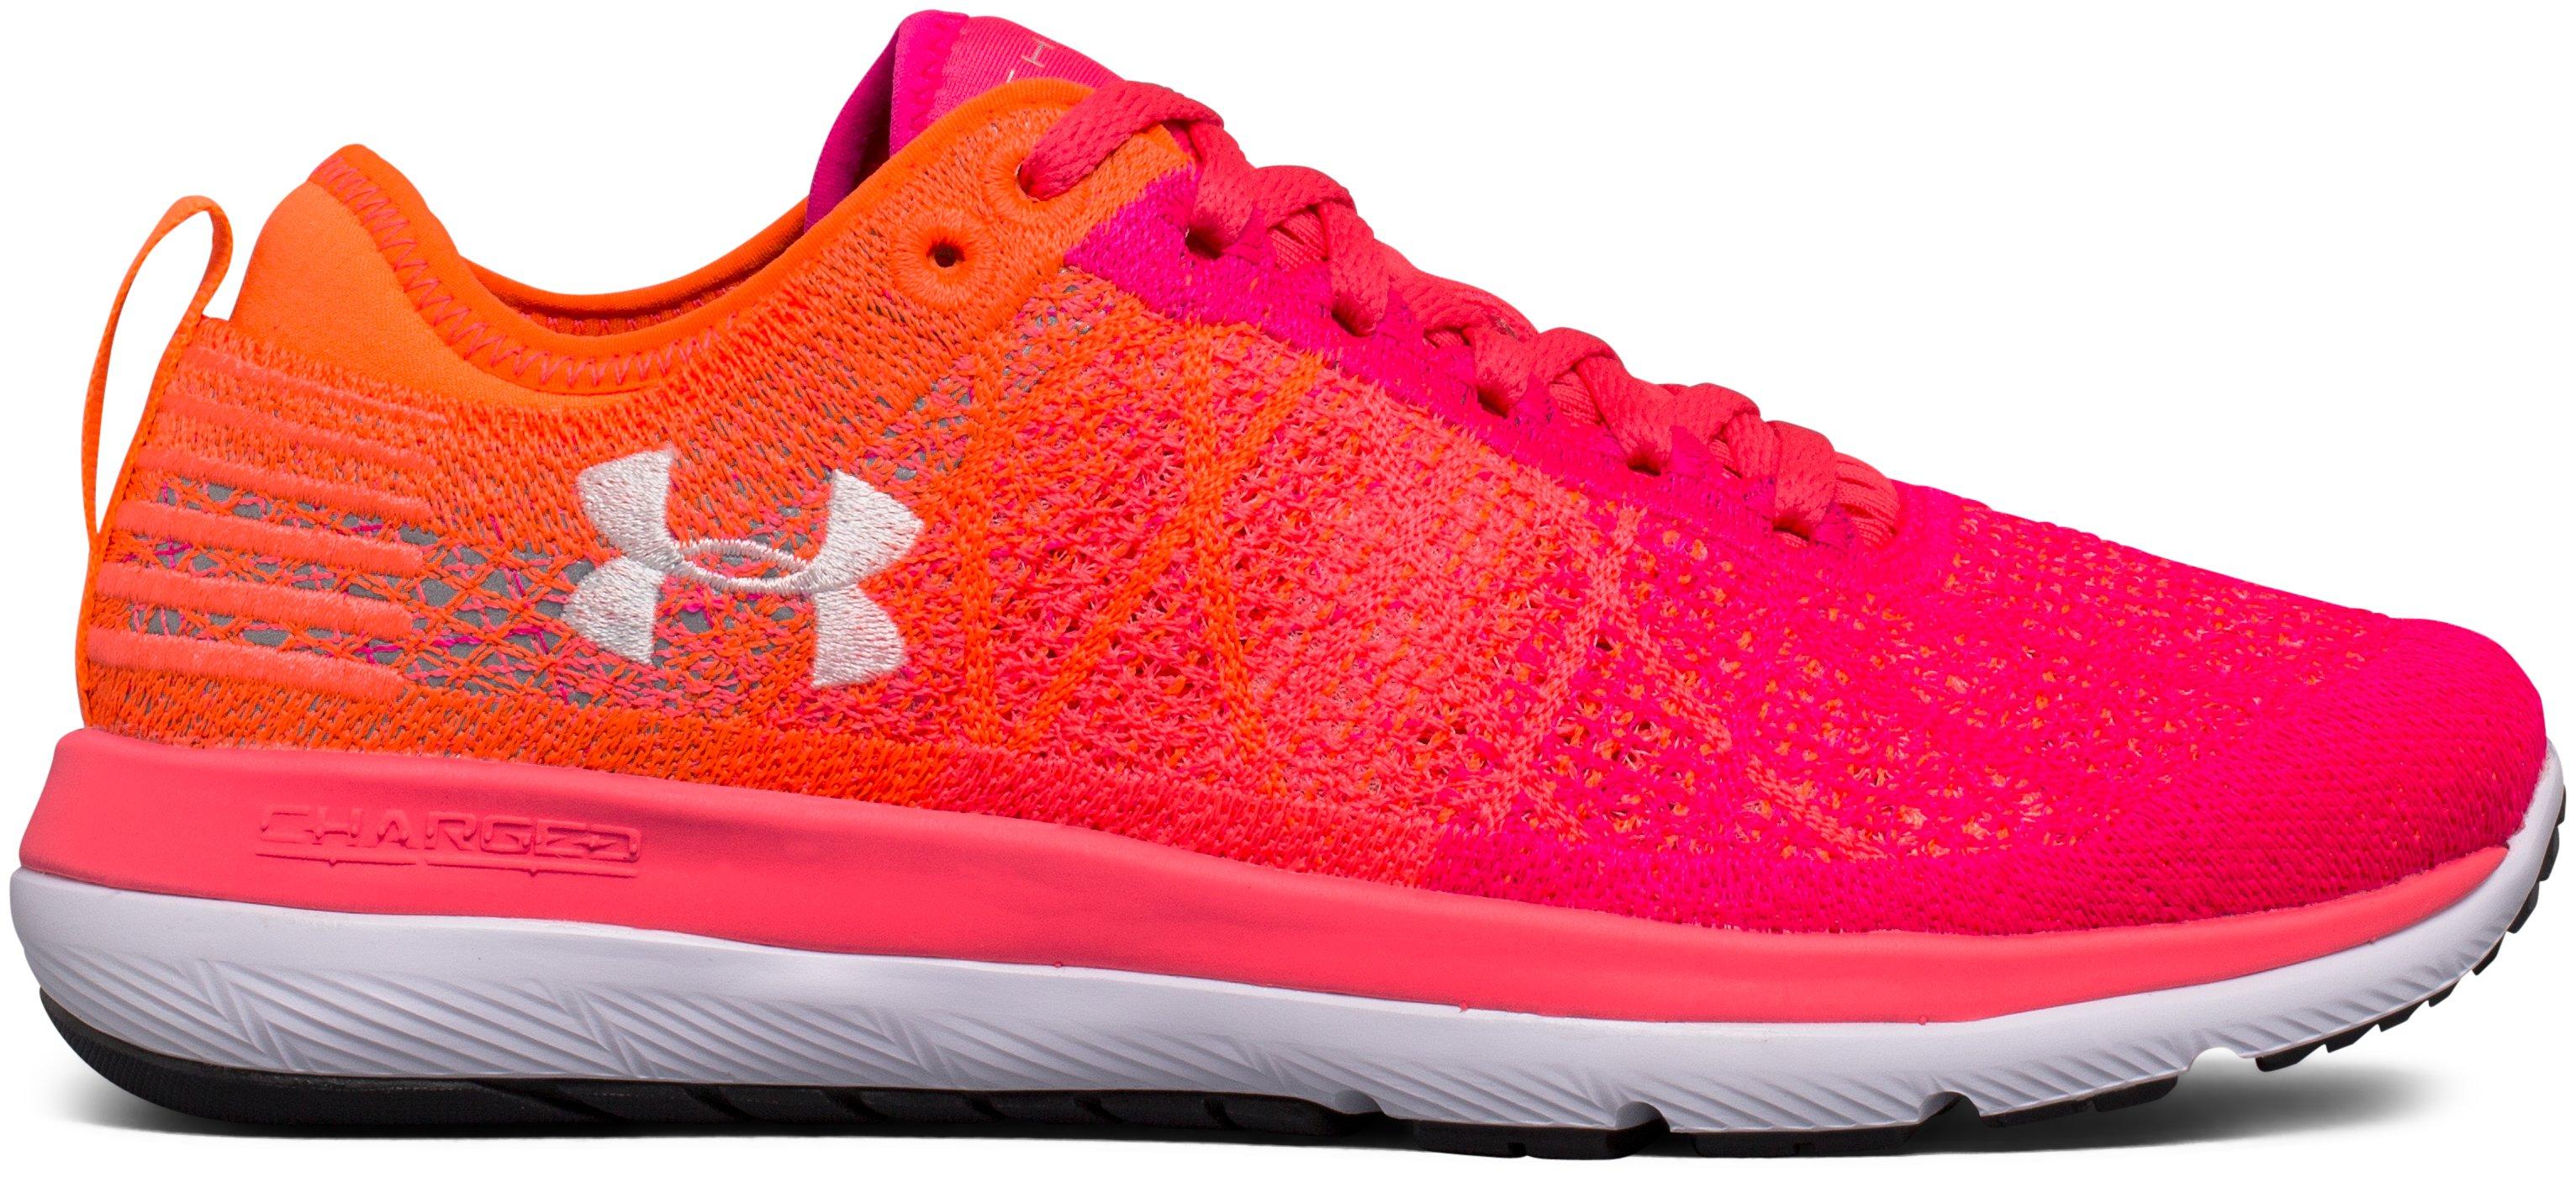 Women's UA Threadborne Fortis 3 Running Shoes, 360 degree view